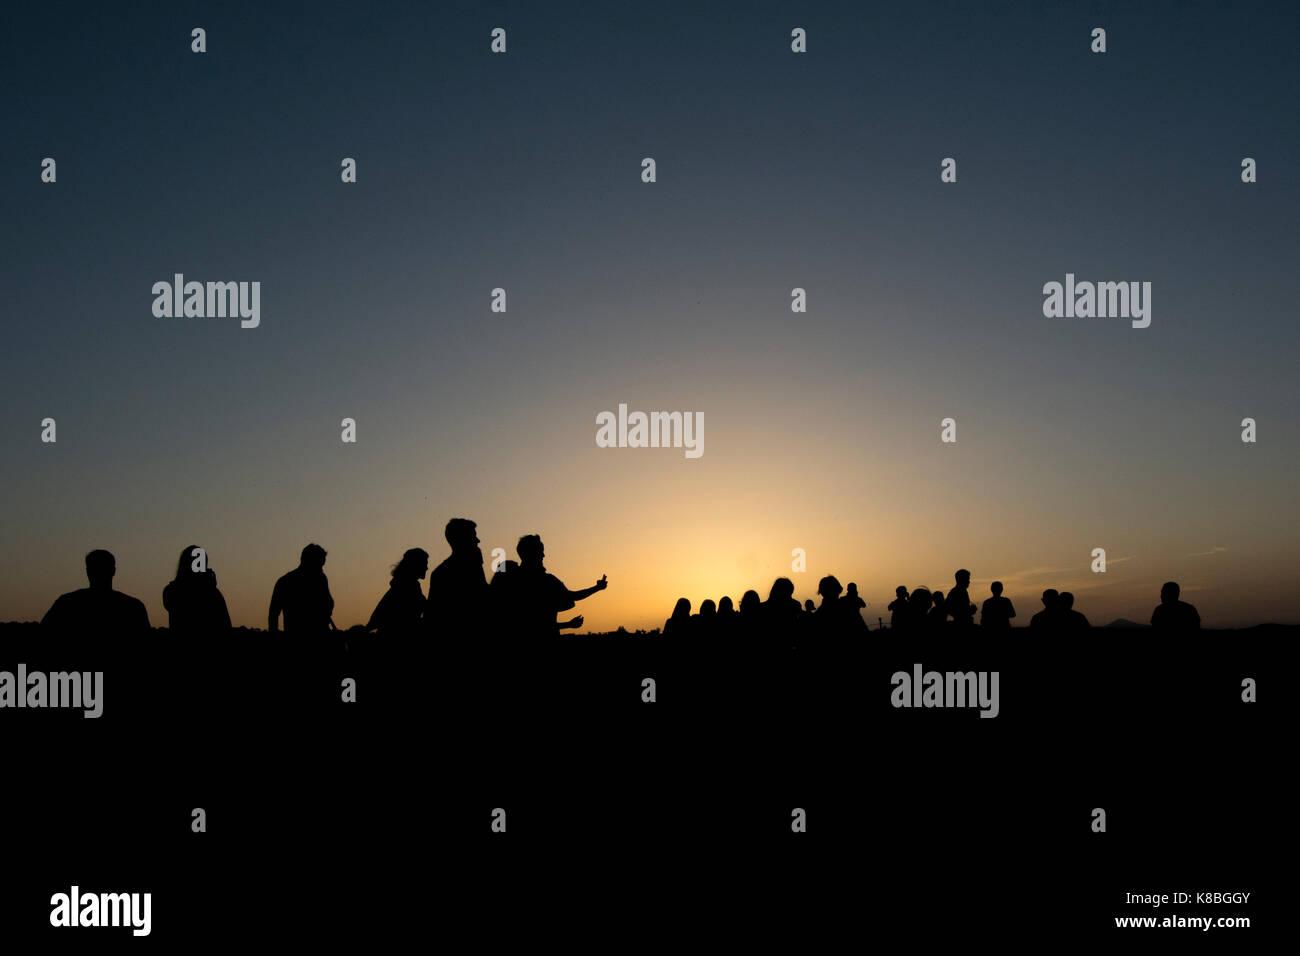 L'homme silhouettes , Göreme, Turquie Photo Stock